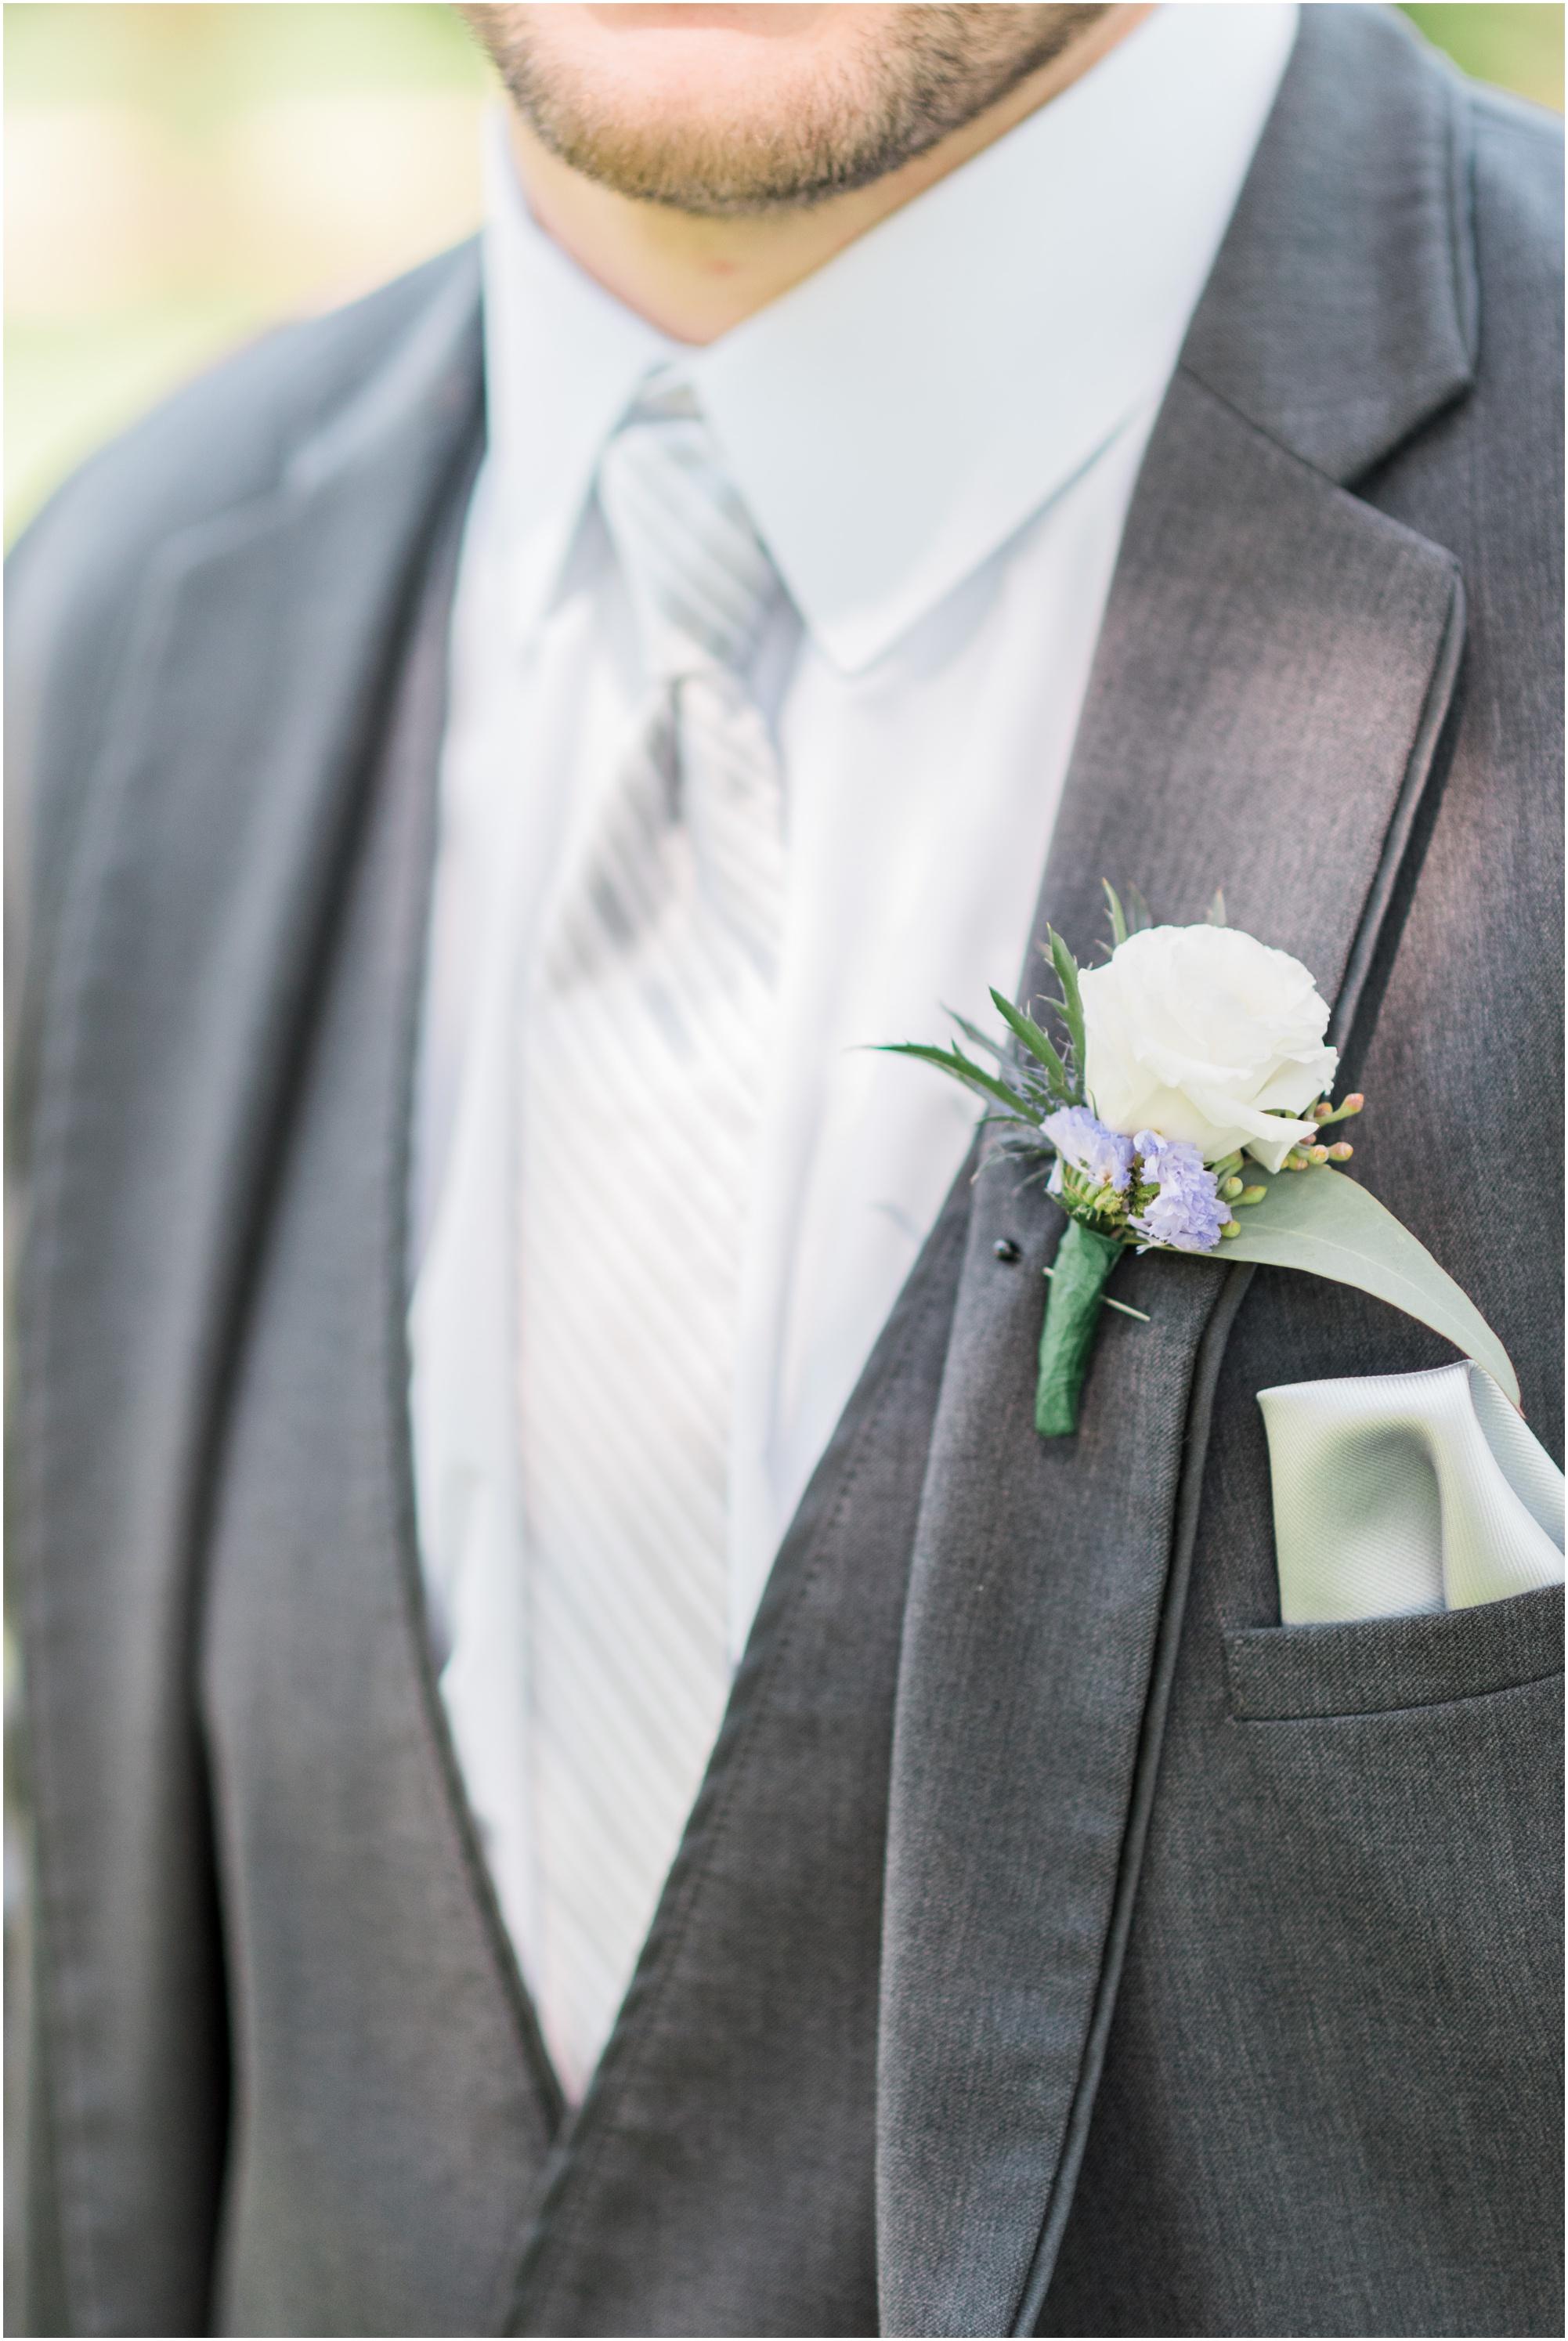 Wisconsin-Wedding-Photographer-Reedsburg-Country-Club-Kaela-and Matt-Wedding-126.jpg